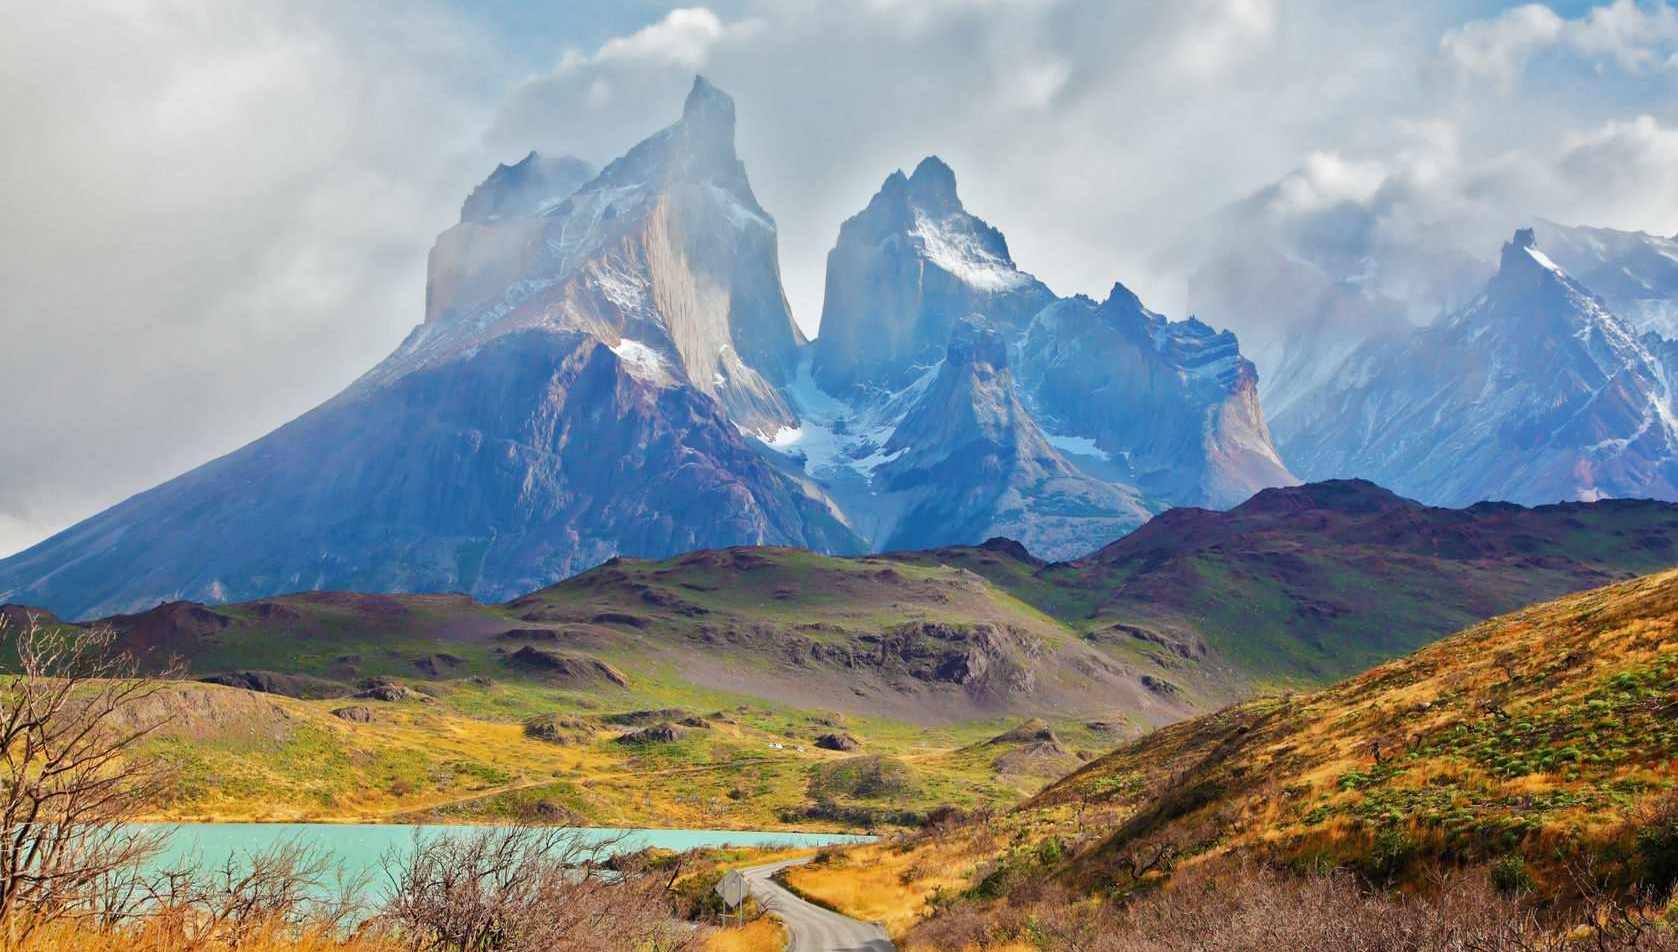 Ofertas de viajes a Chile patagonia